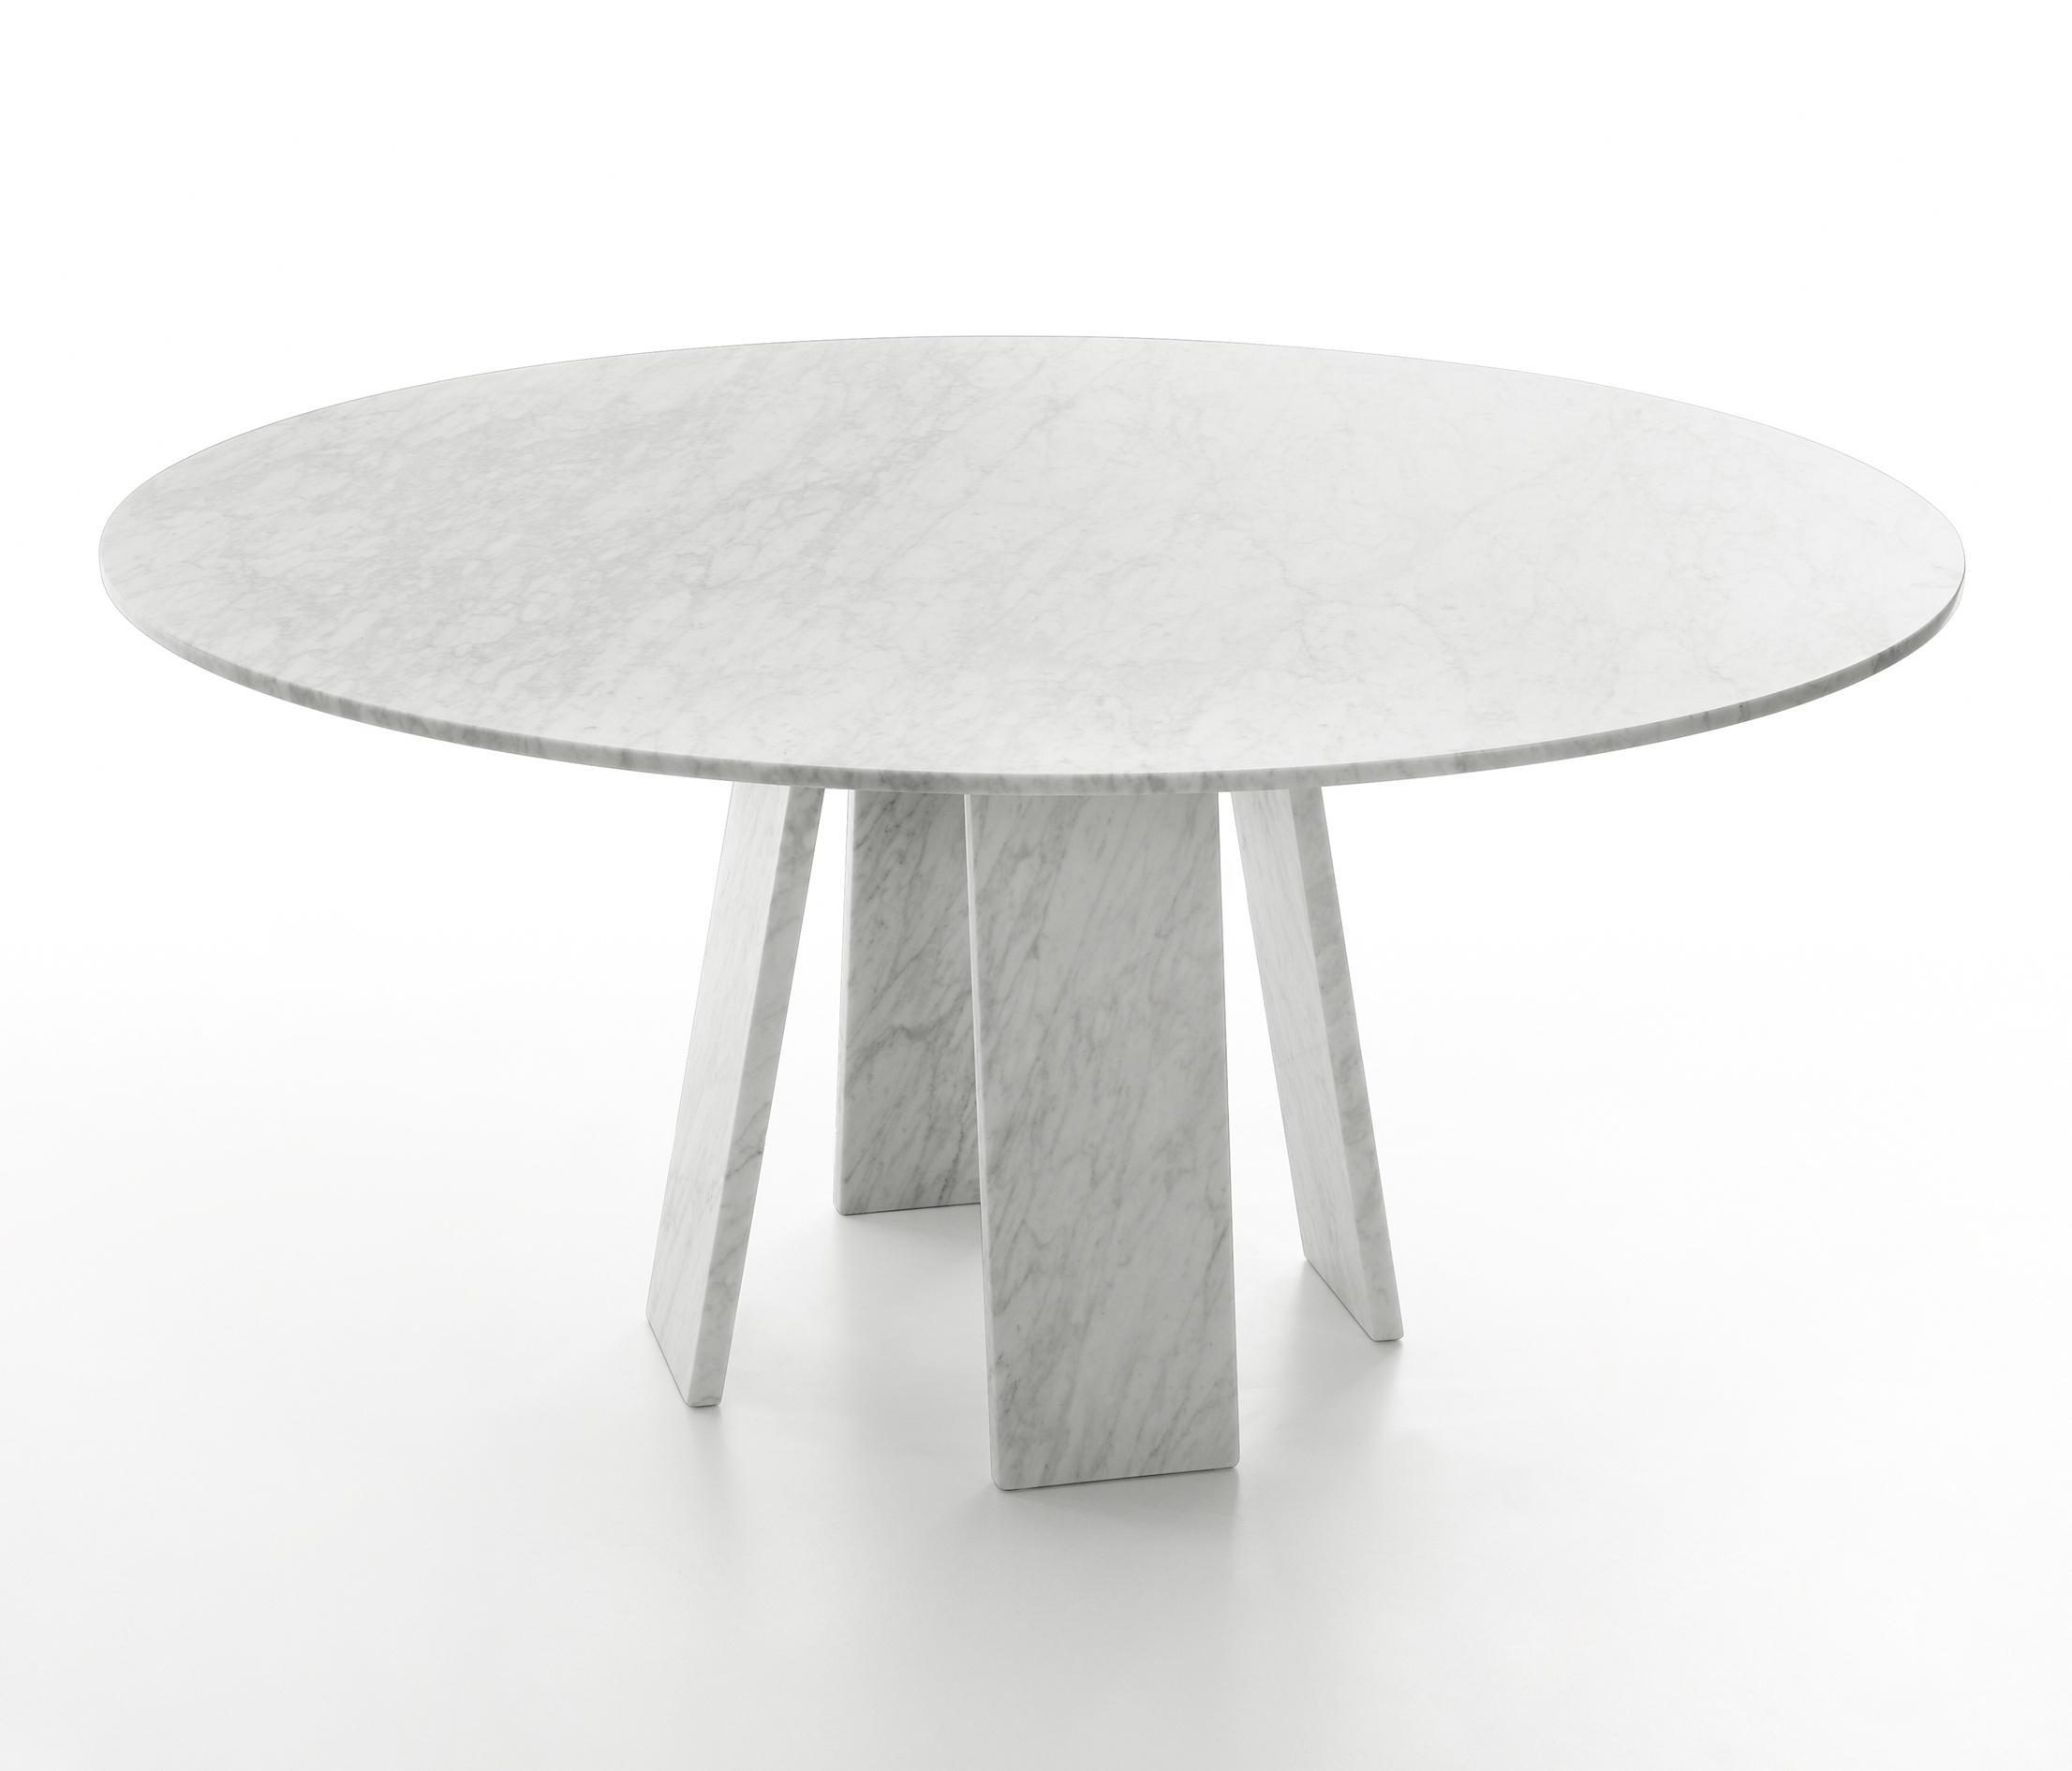 Topkapi tavoli pranzo marsotto edizioni architonic for Produttori tavoli